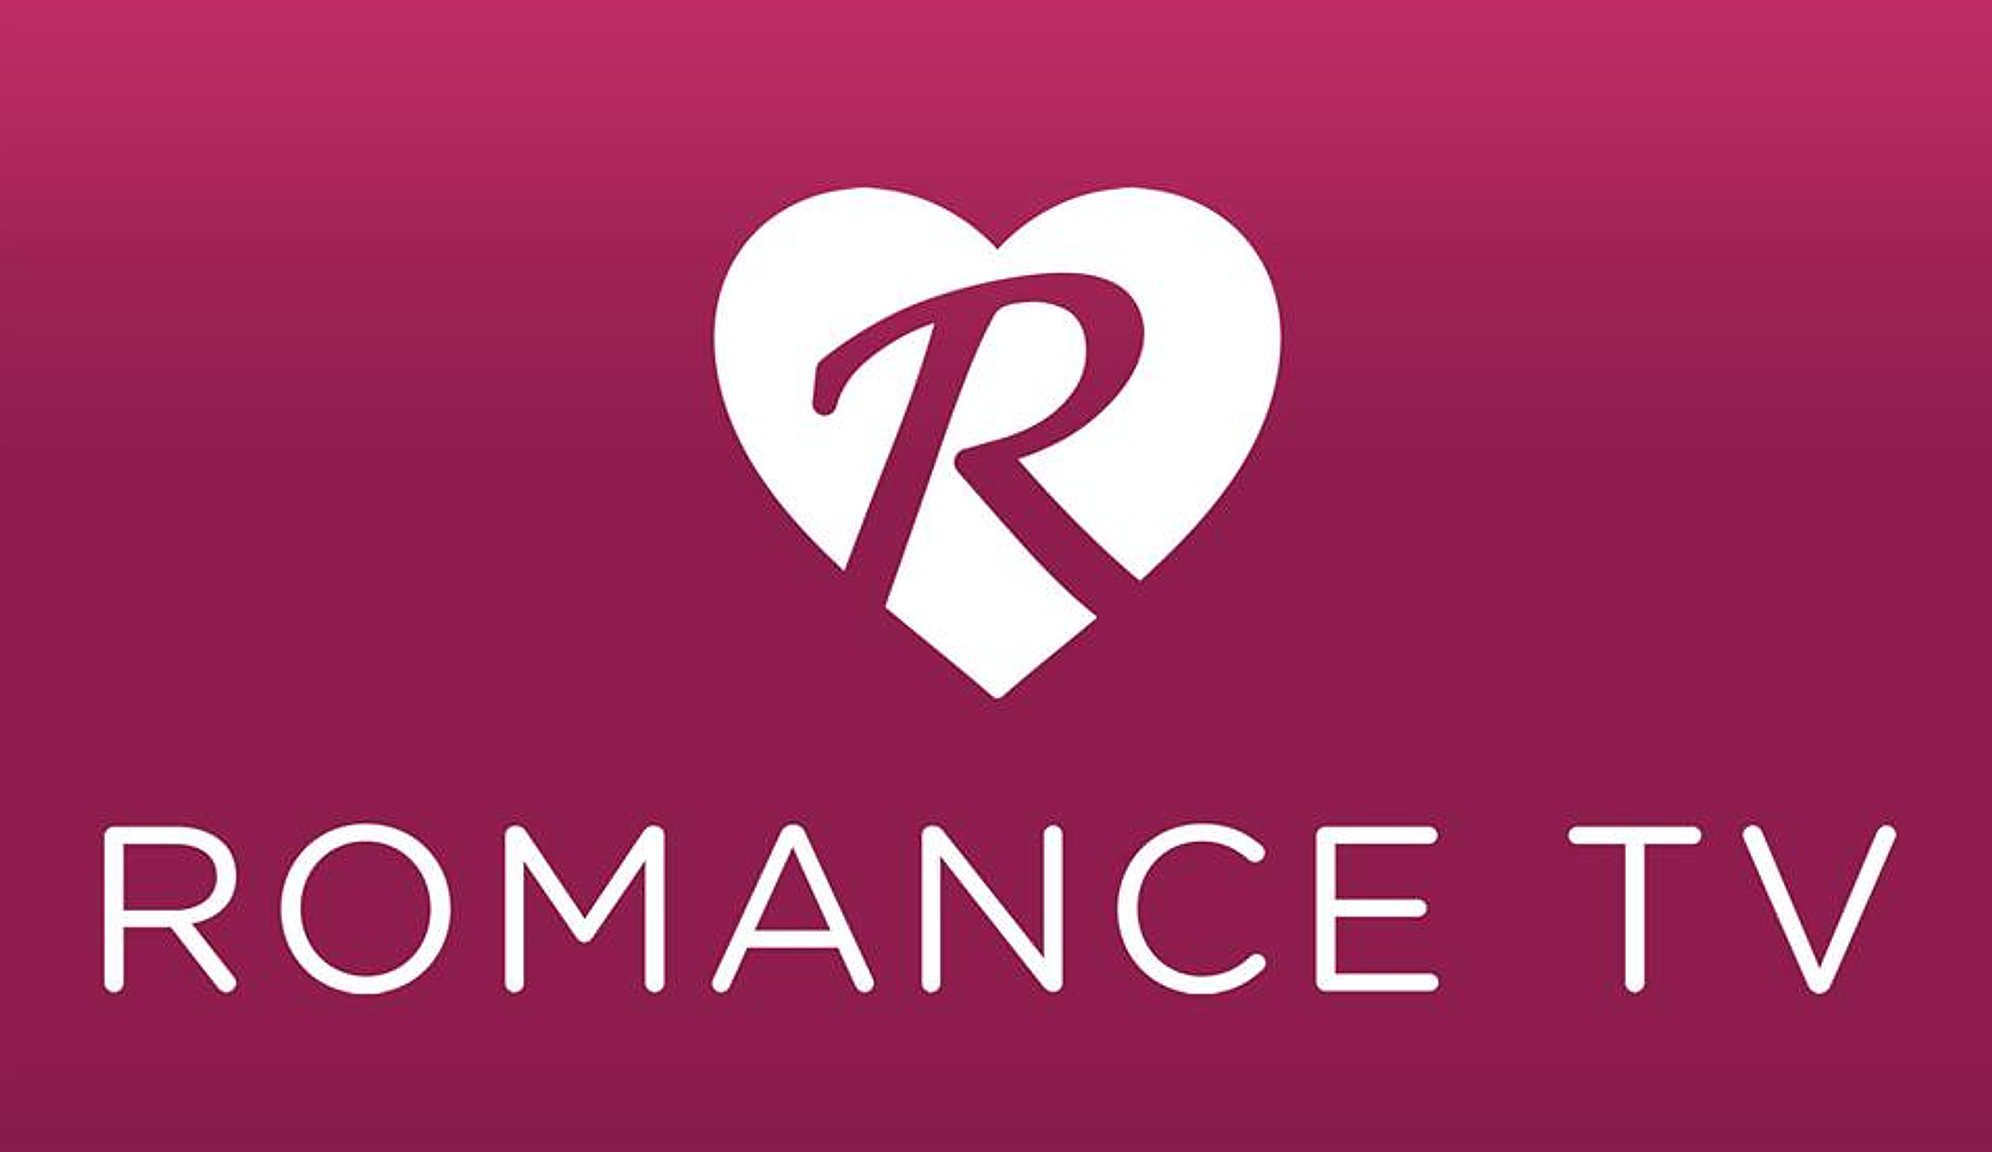 www romance tv